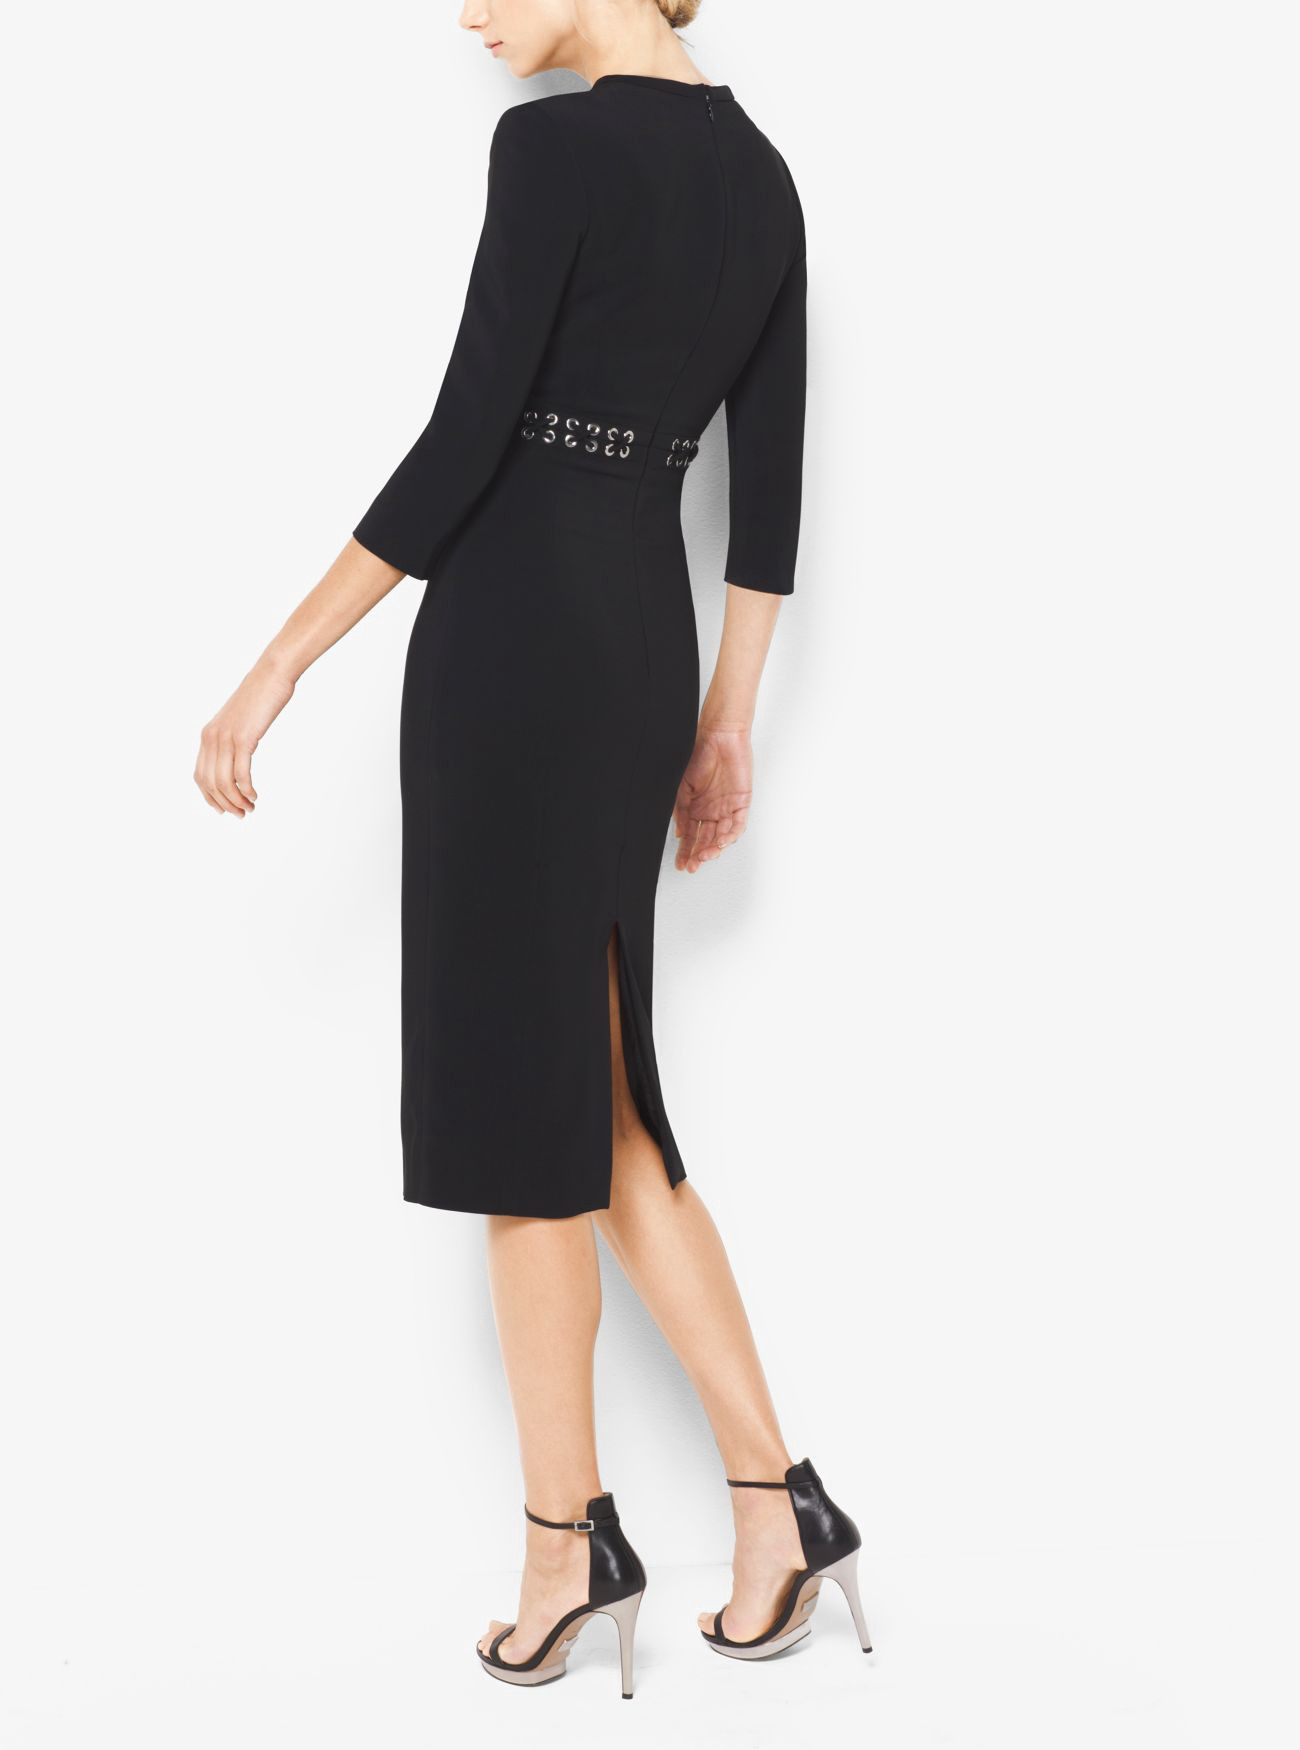 80de29374de1 MICHAEL Michael Kors Stretch-Viscose Peekaboo Midi Dress | Quick Saves |  Dresses, Black midi dress, Stretches